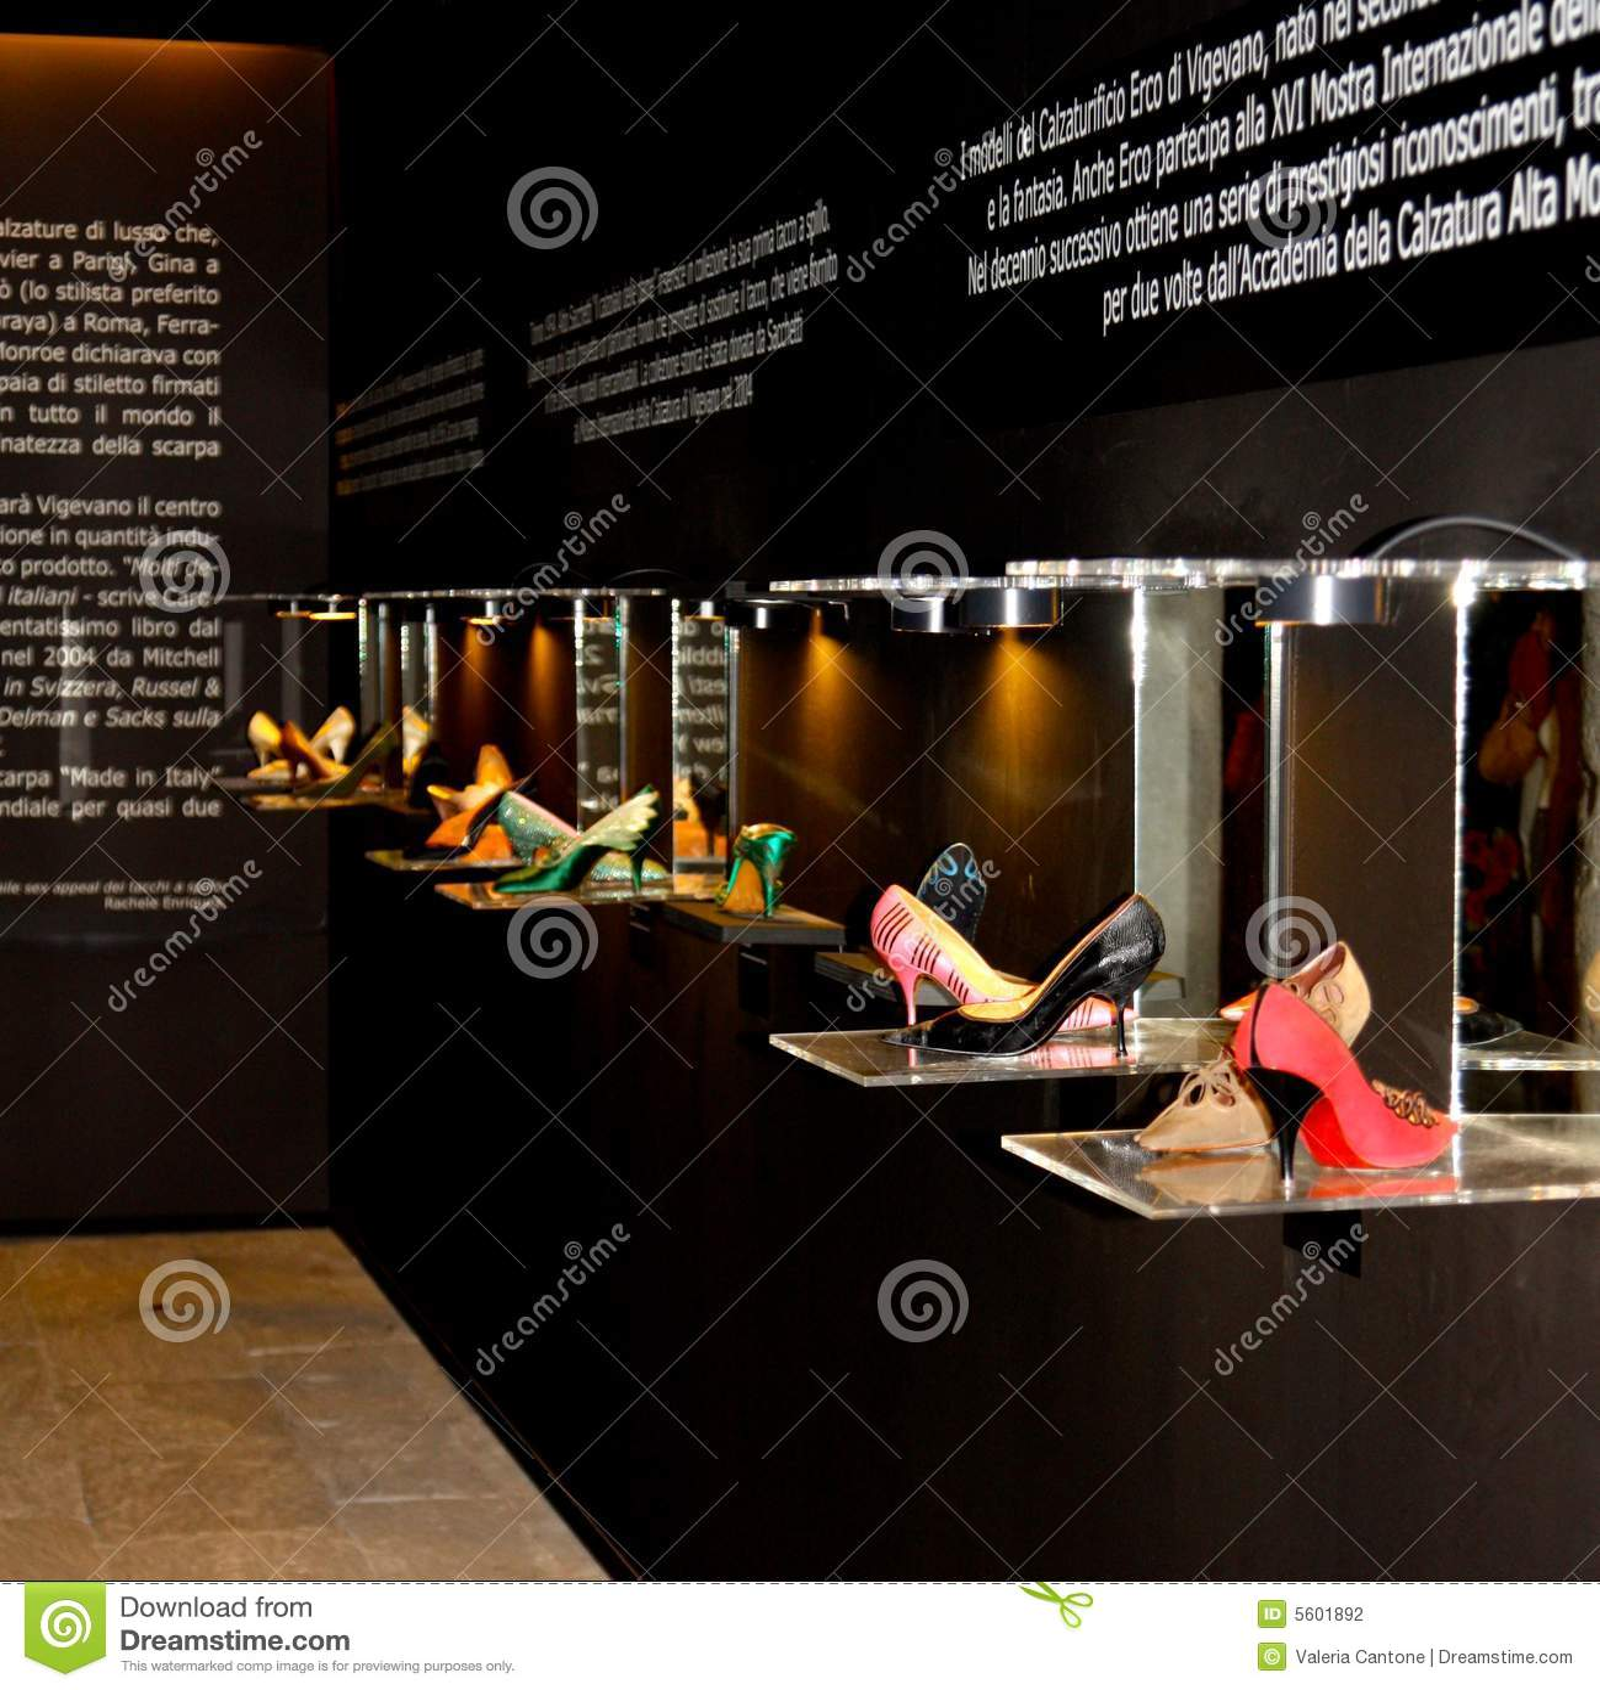 Shoes exhibition in Vigevano